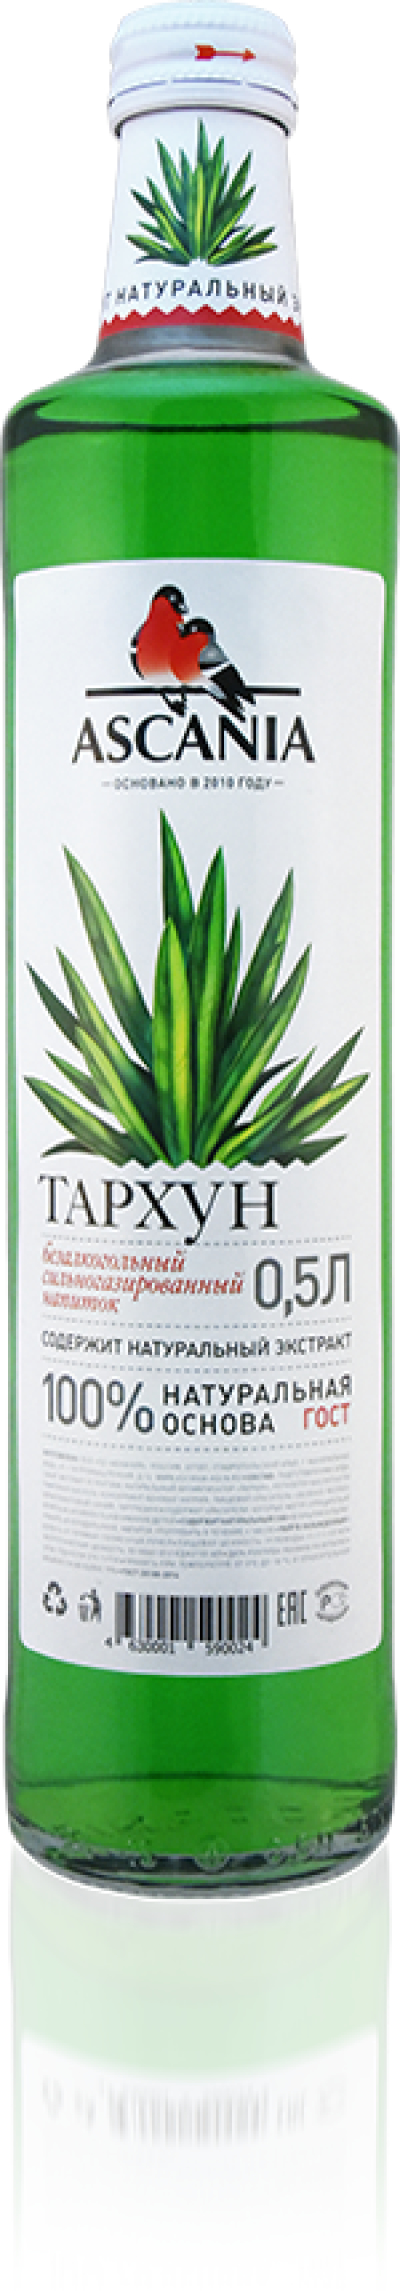 Напиток 'Аскания' Тархун